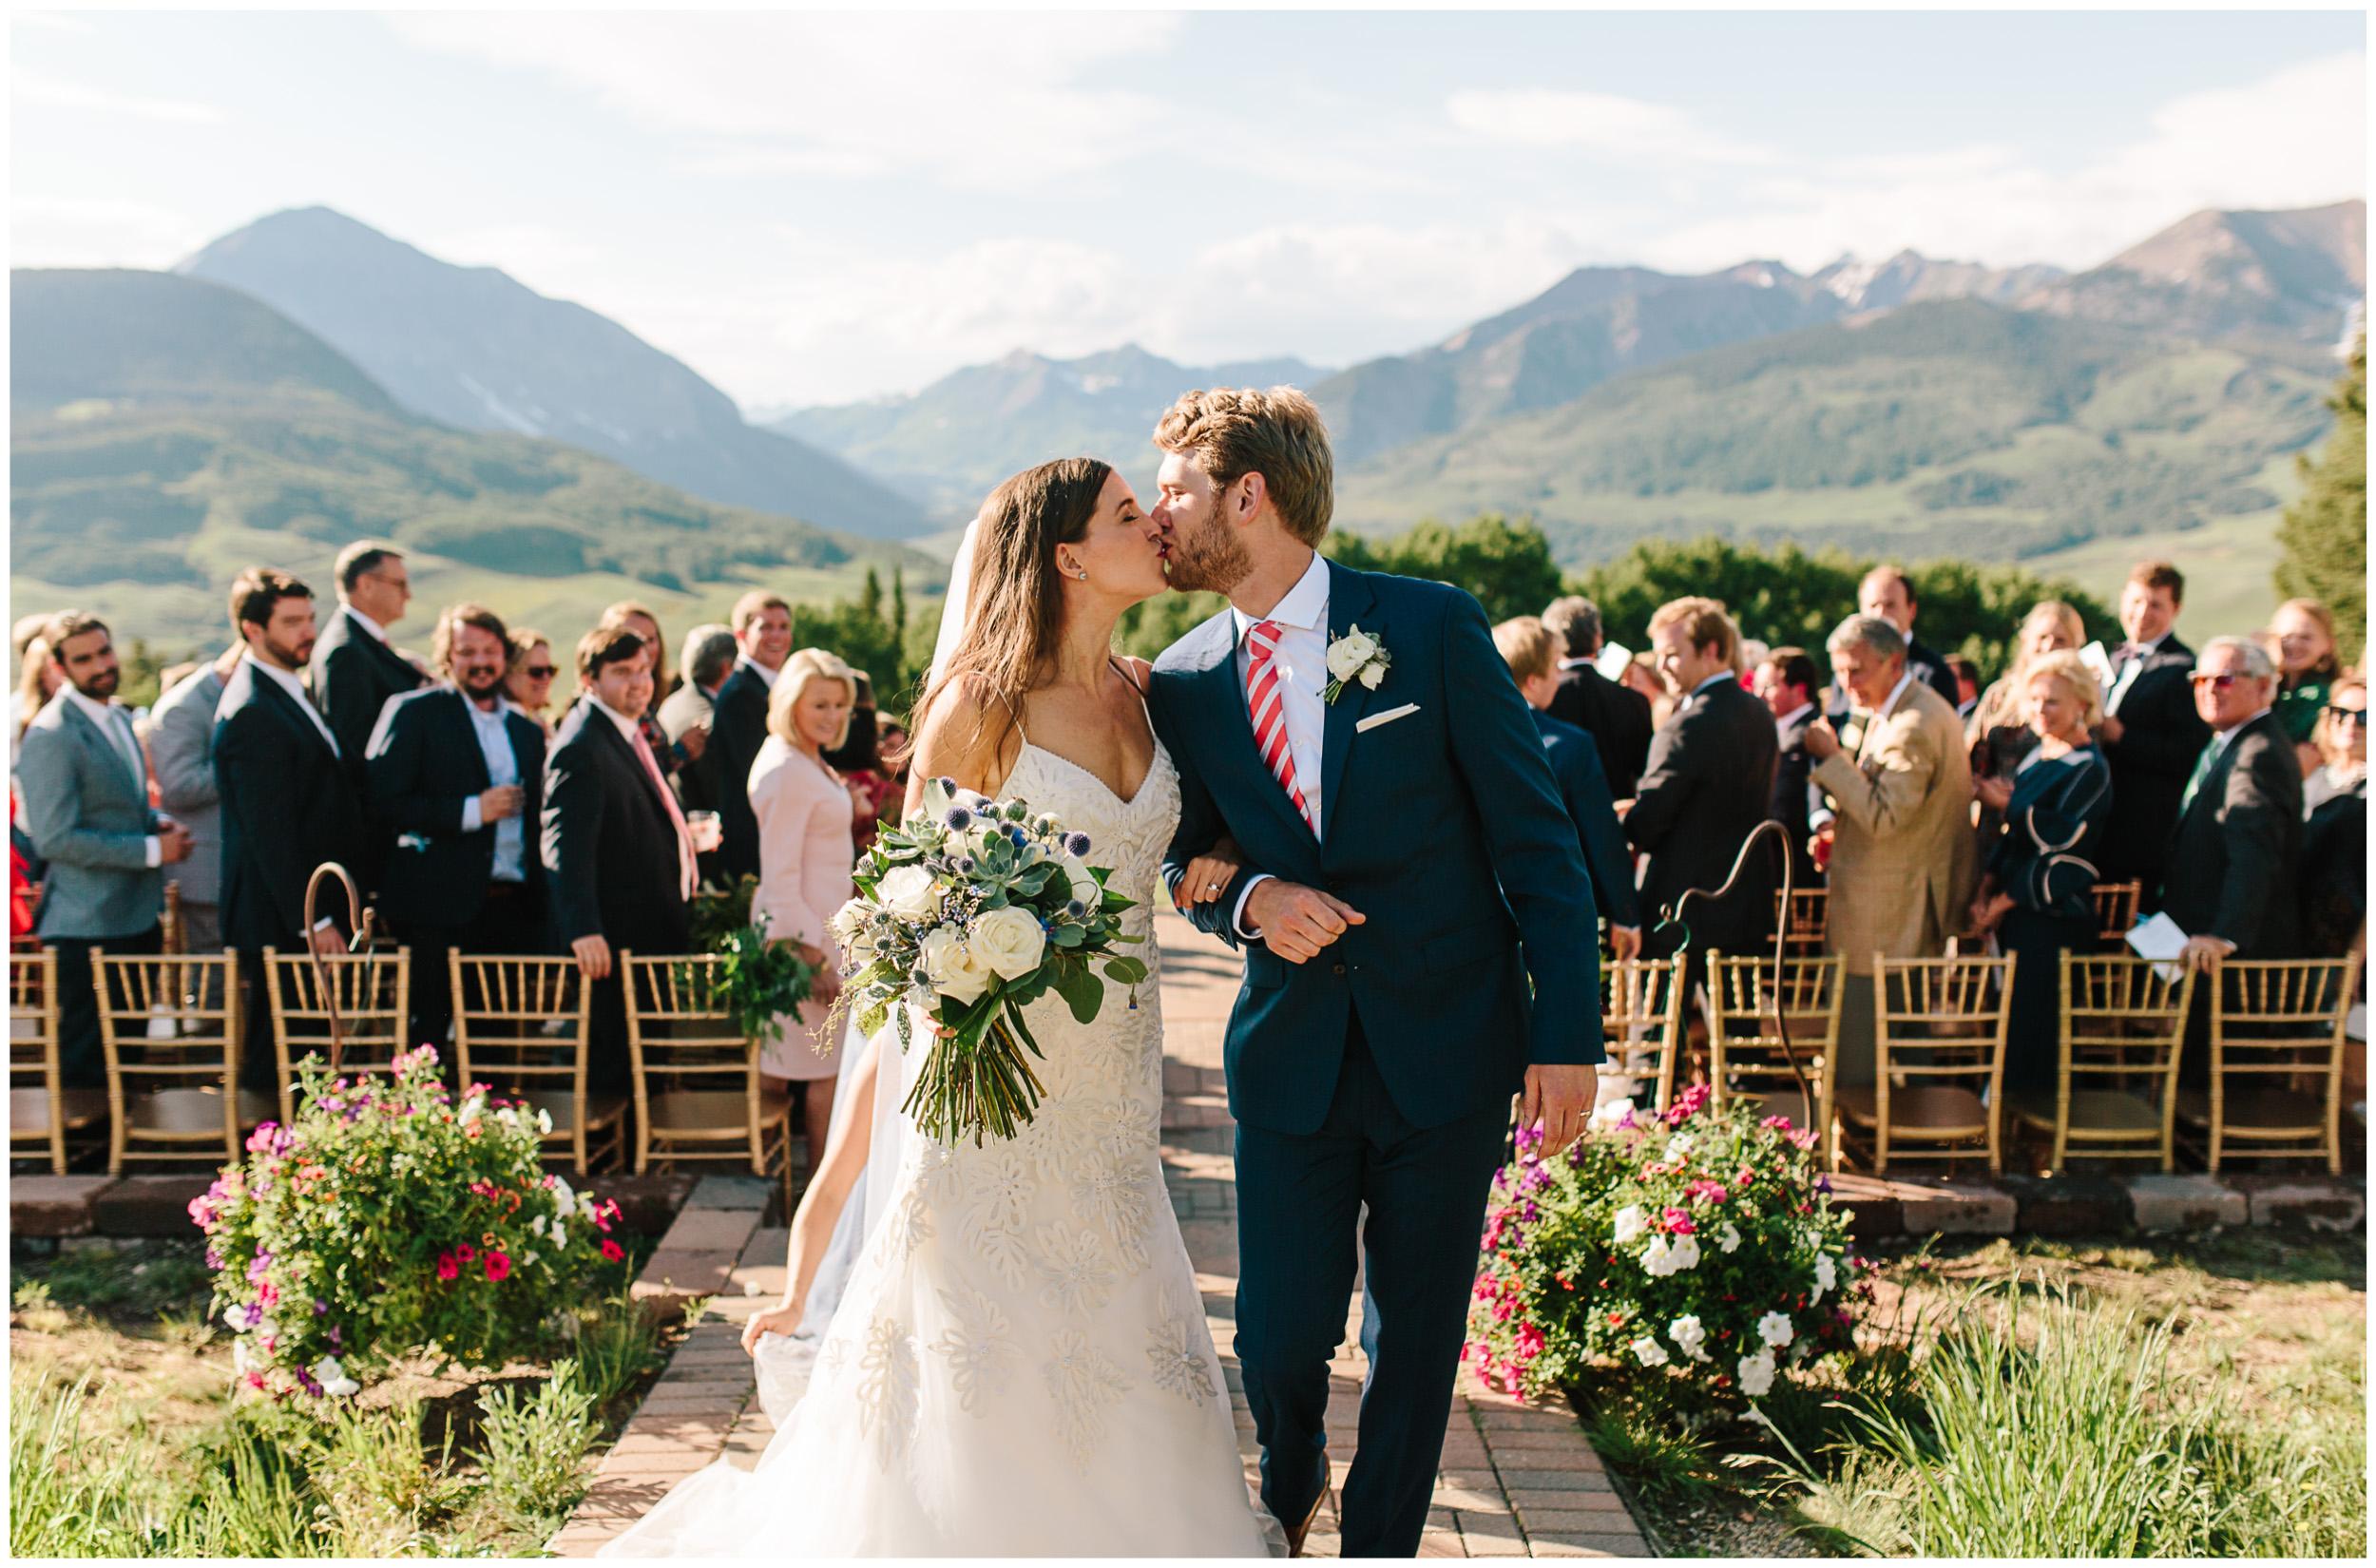 crested_butte_wedding_92.jpg